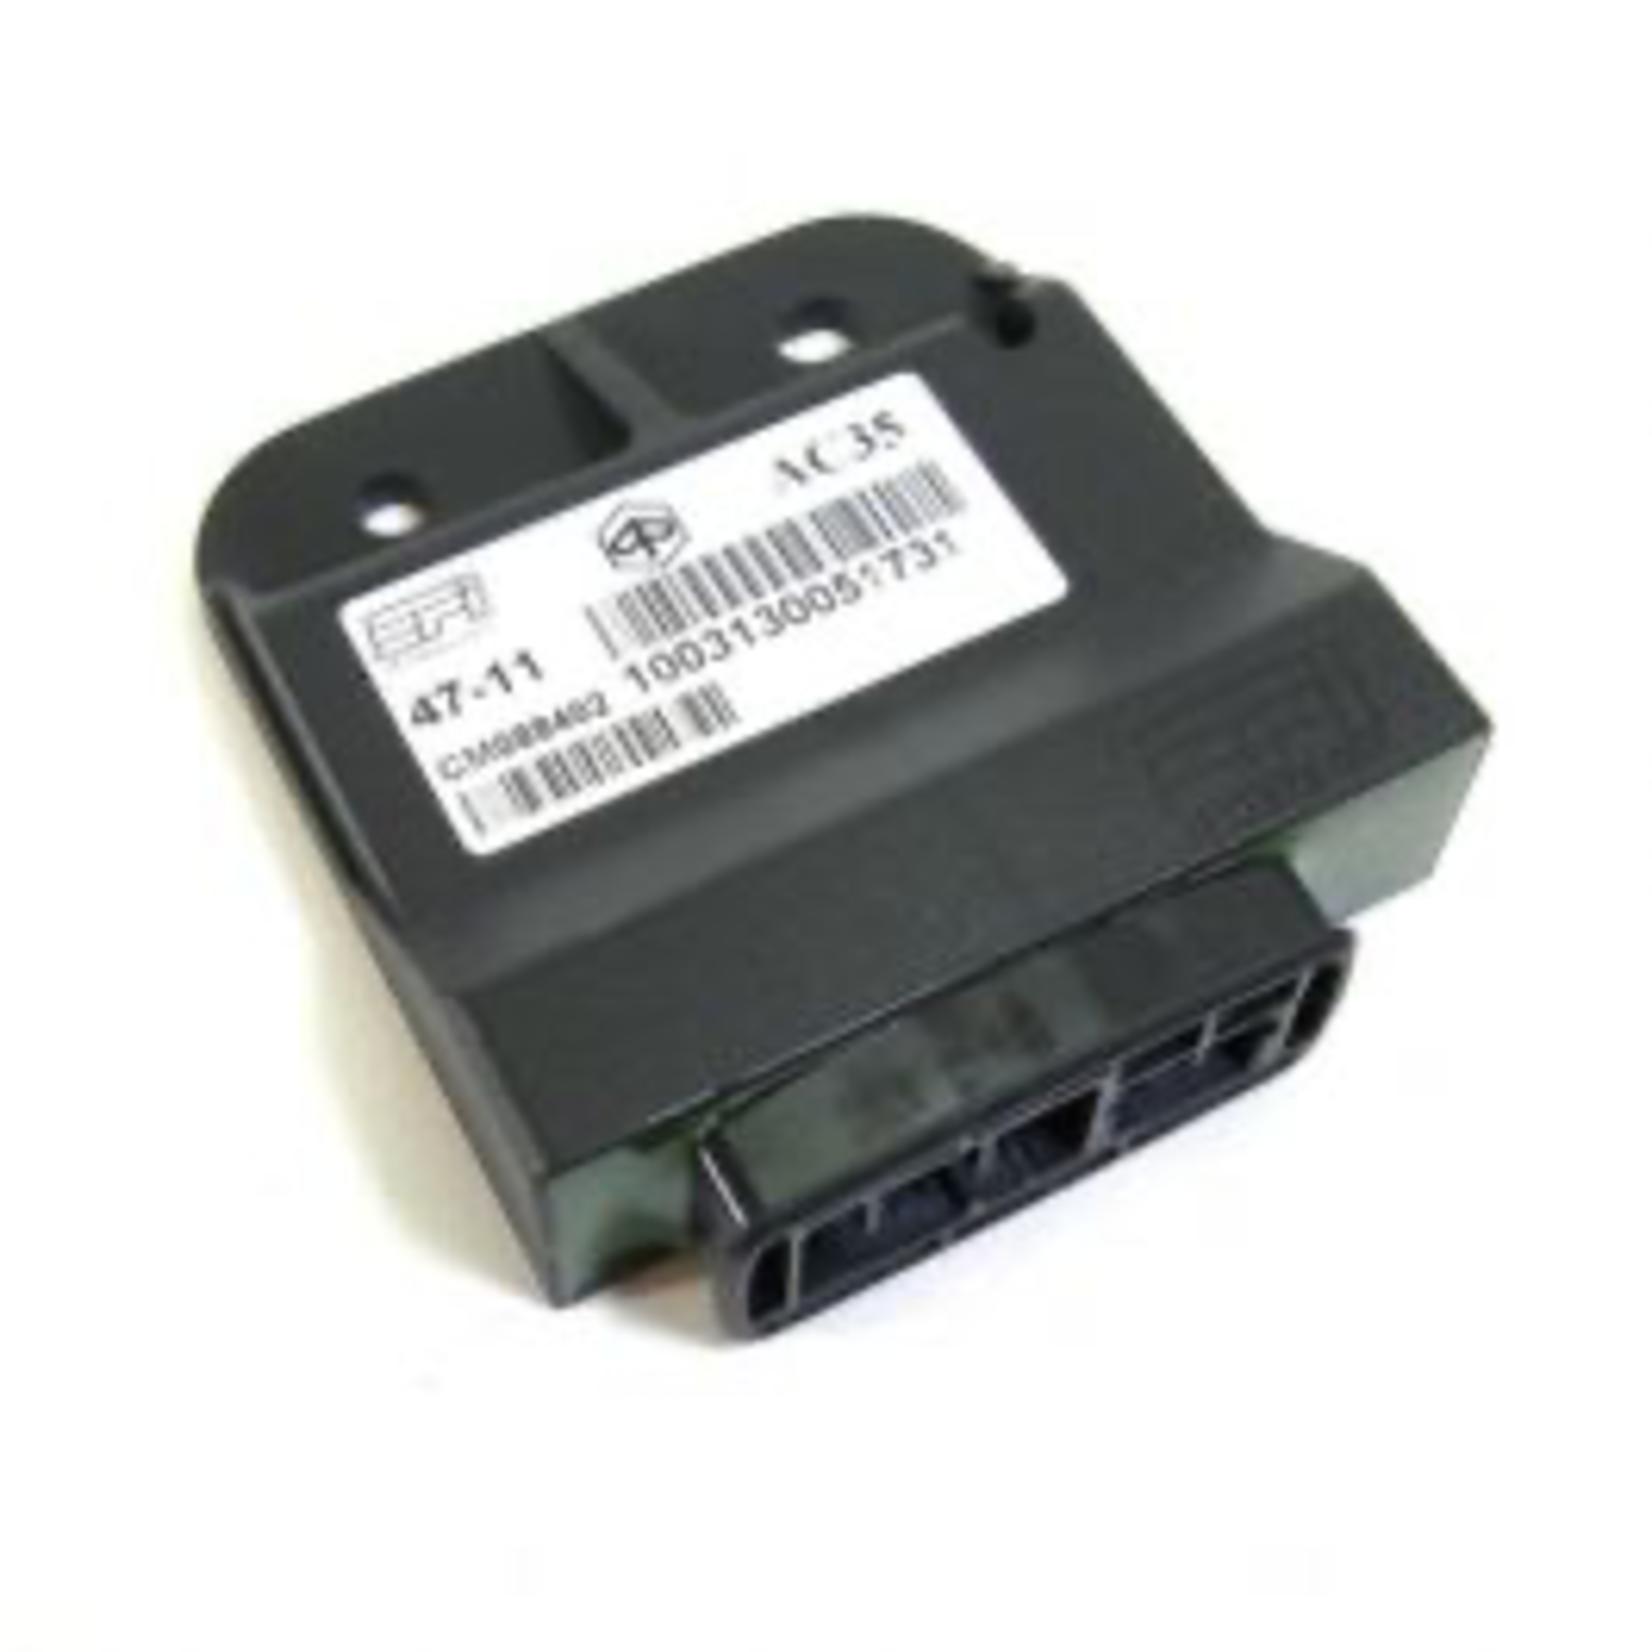 Parts ECU/CDI, Vespa Primavera/Sprint 150 i-GET/ABS